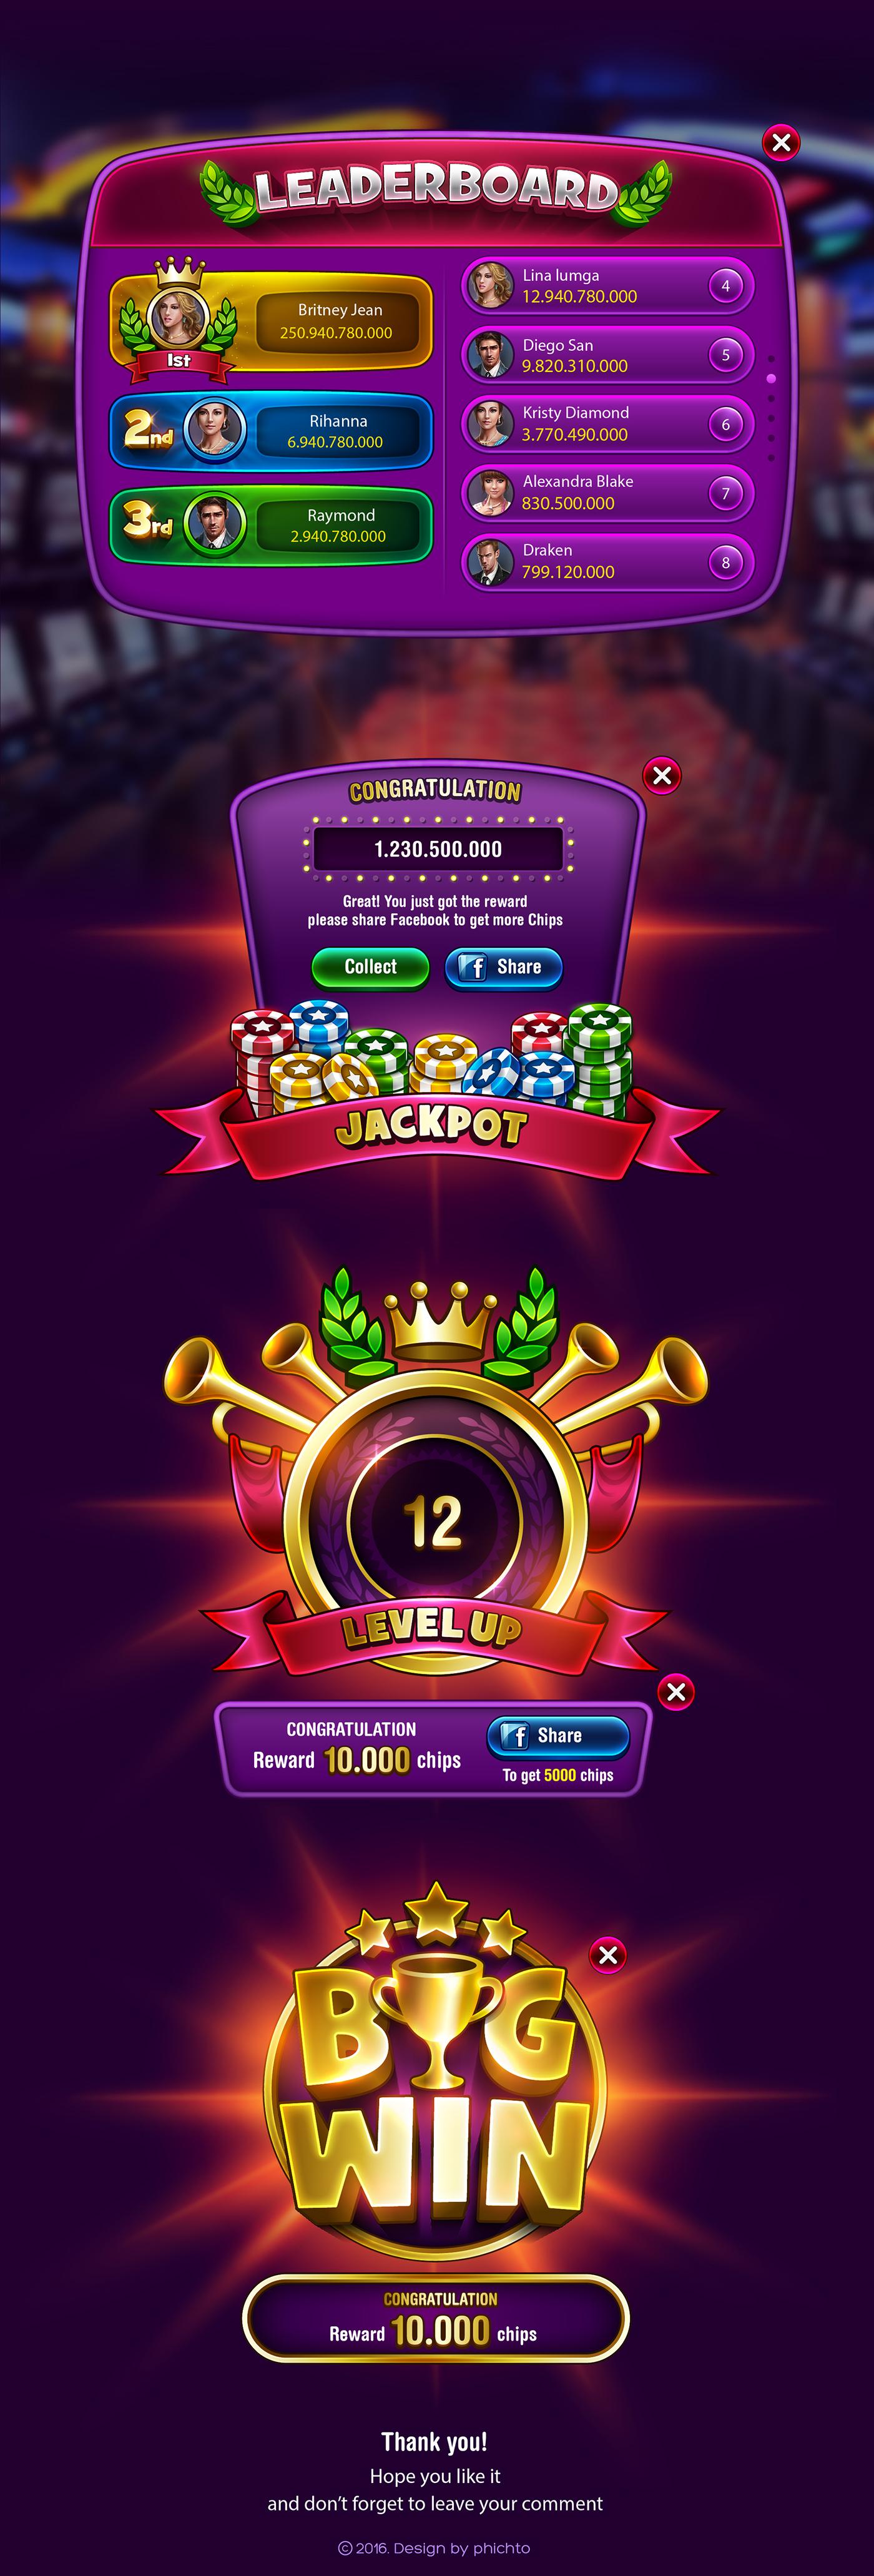 Caesars palace online roulette